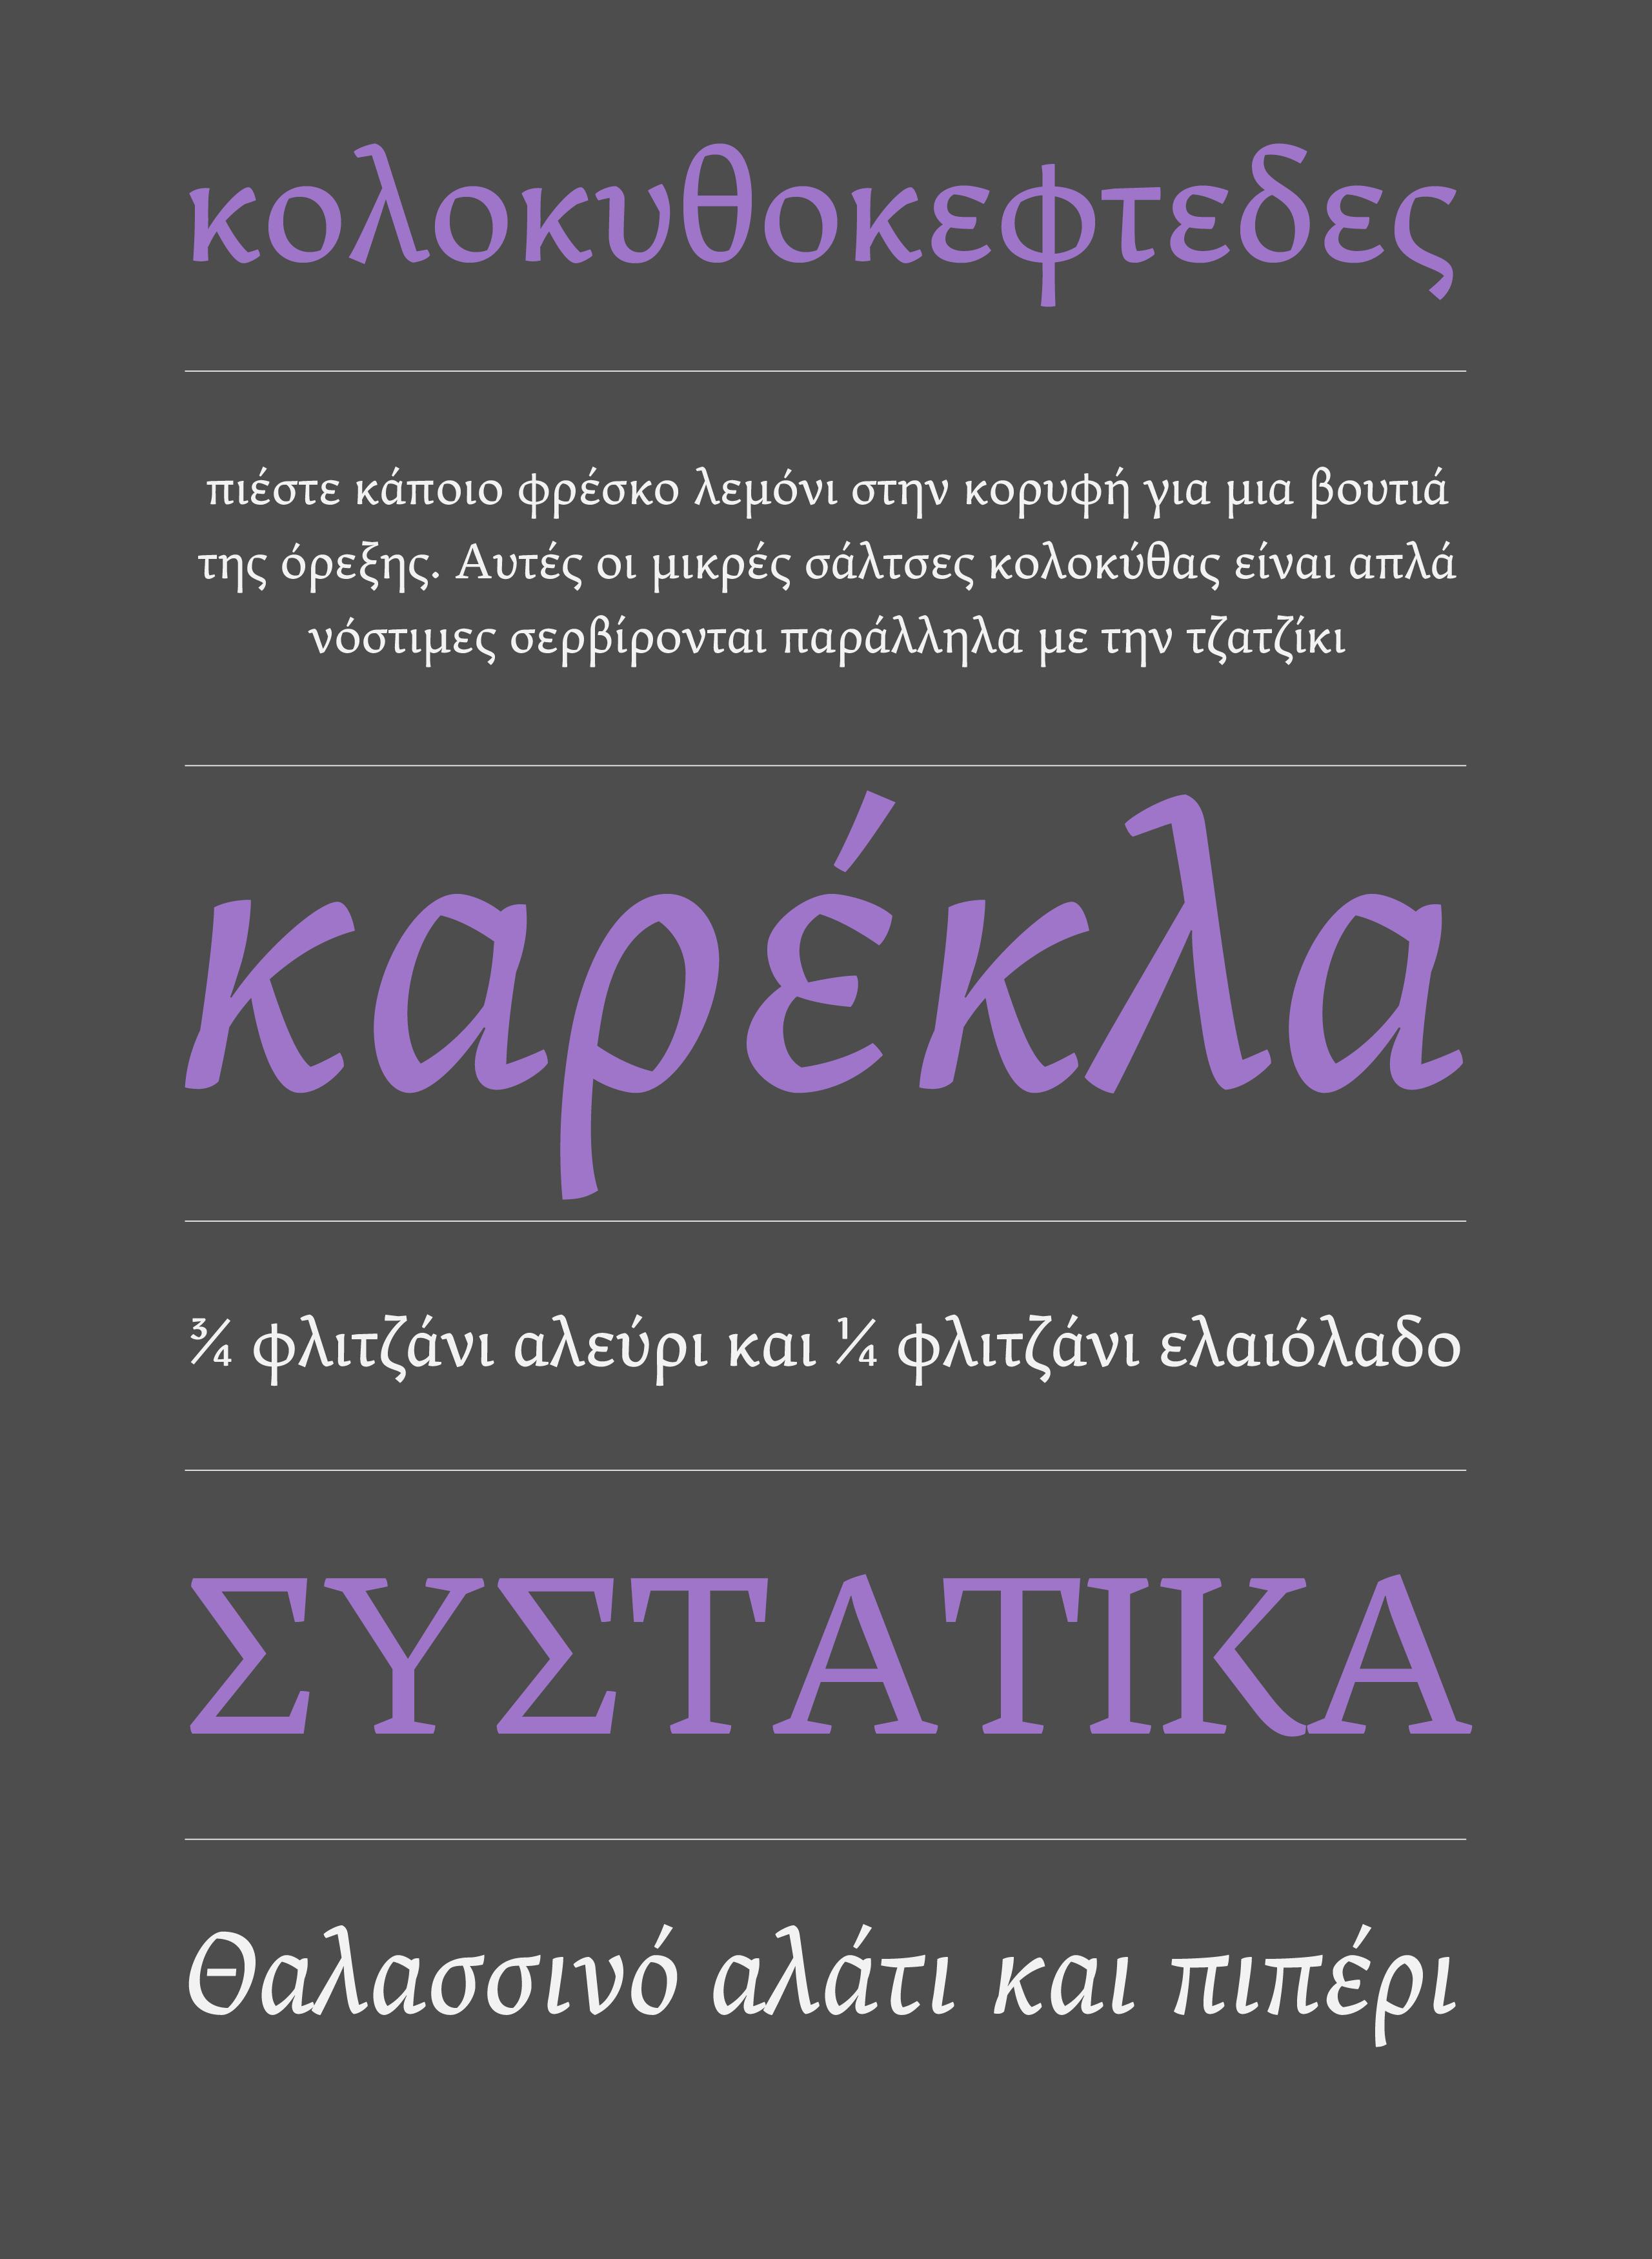 Arek_specimen_01